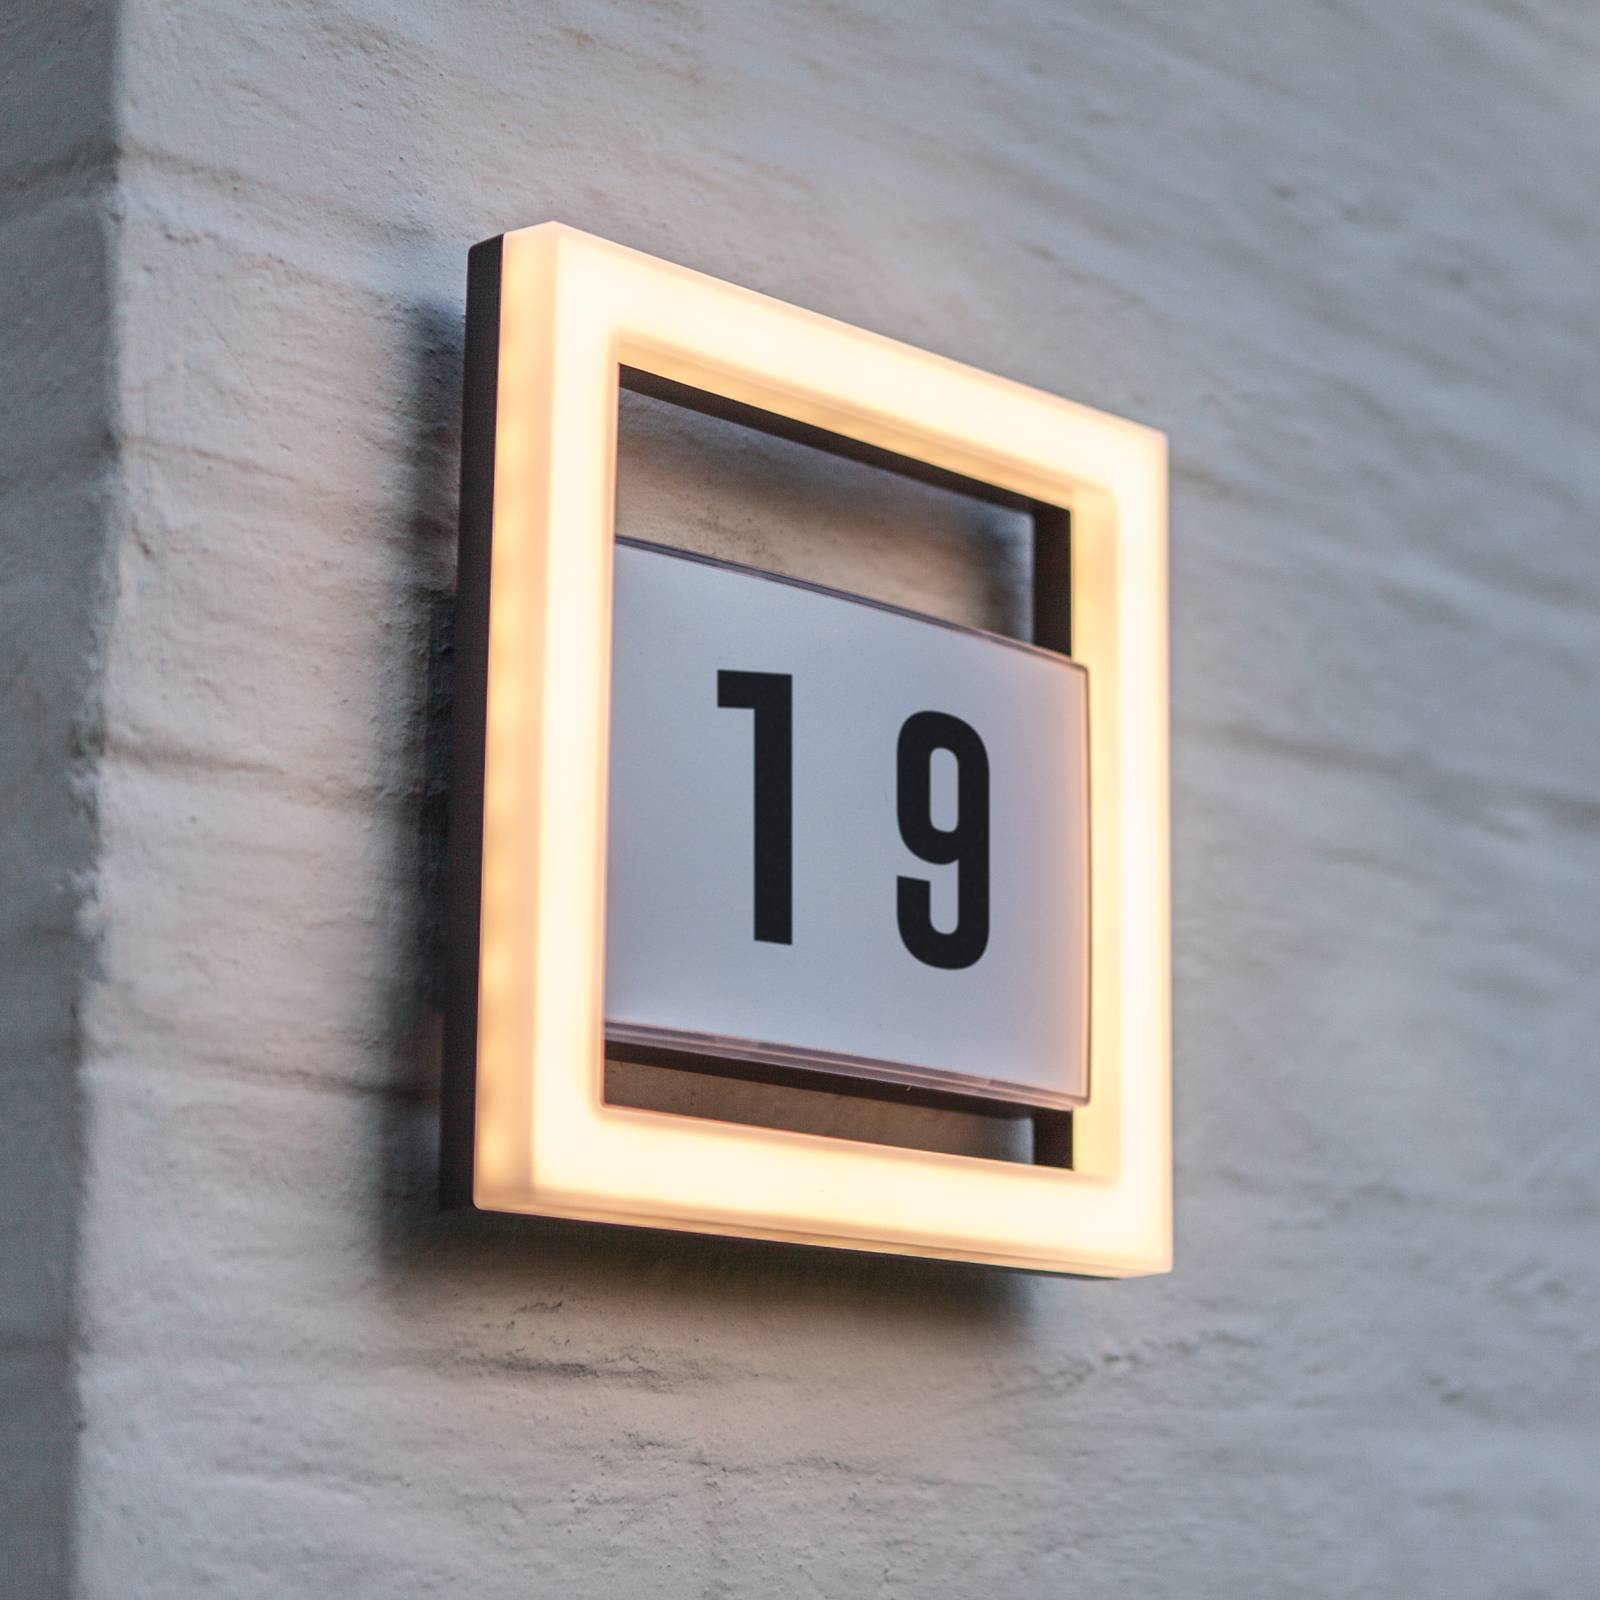 LED-Hausnummernleuchte Alice ohne Sensor günstig online kaufen